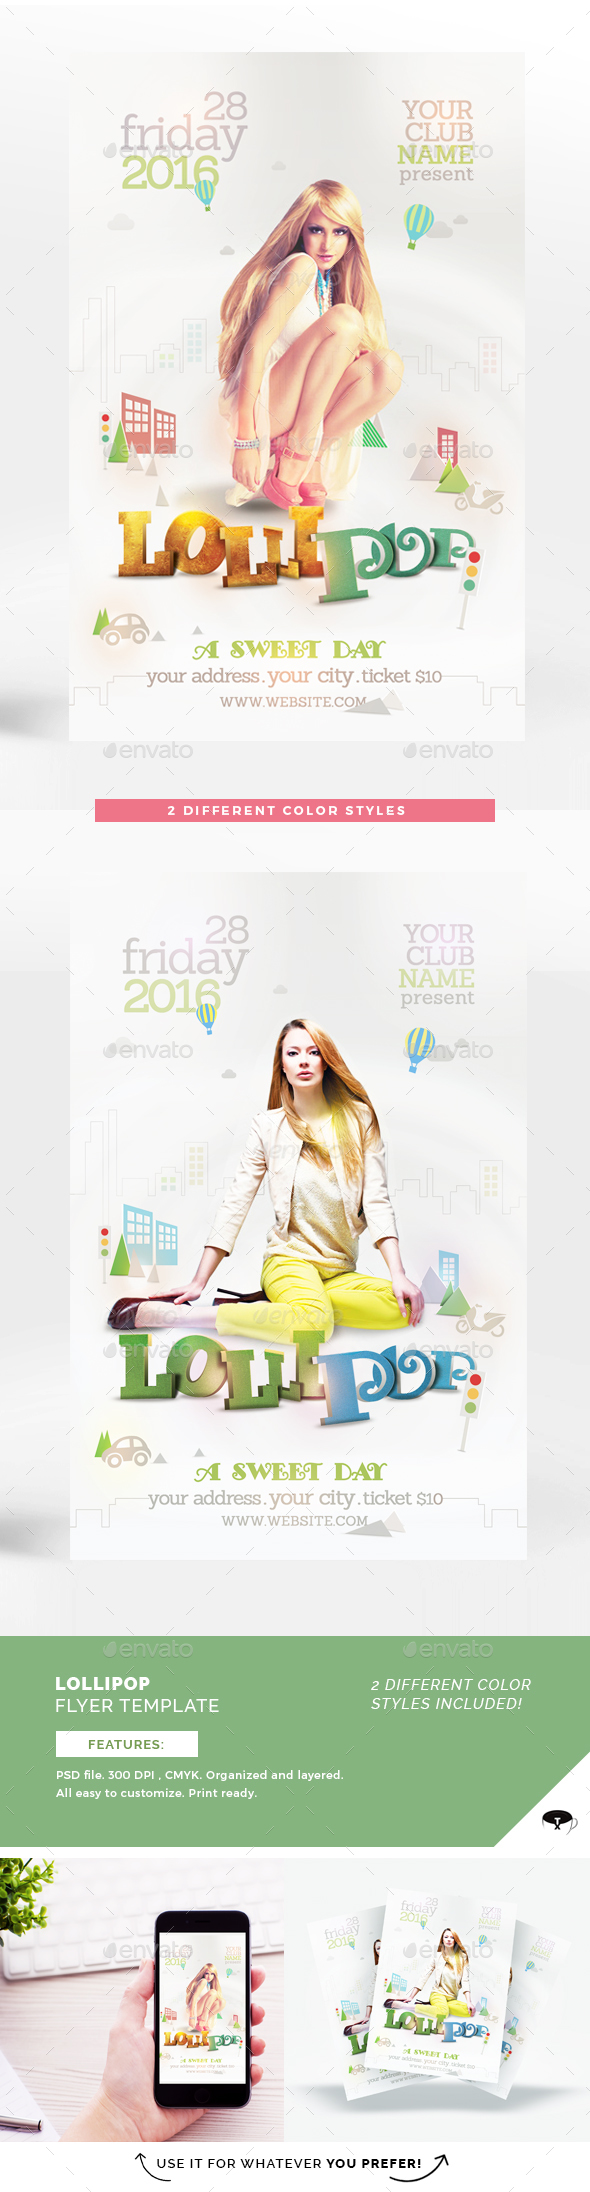 Lollipop Flyer Template - Clubs & Parties Events